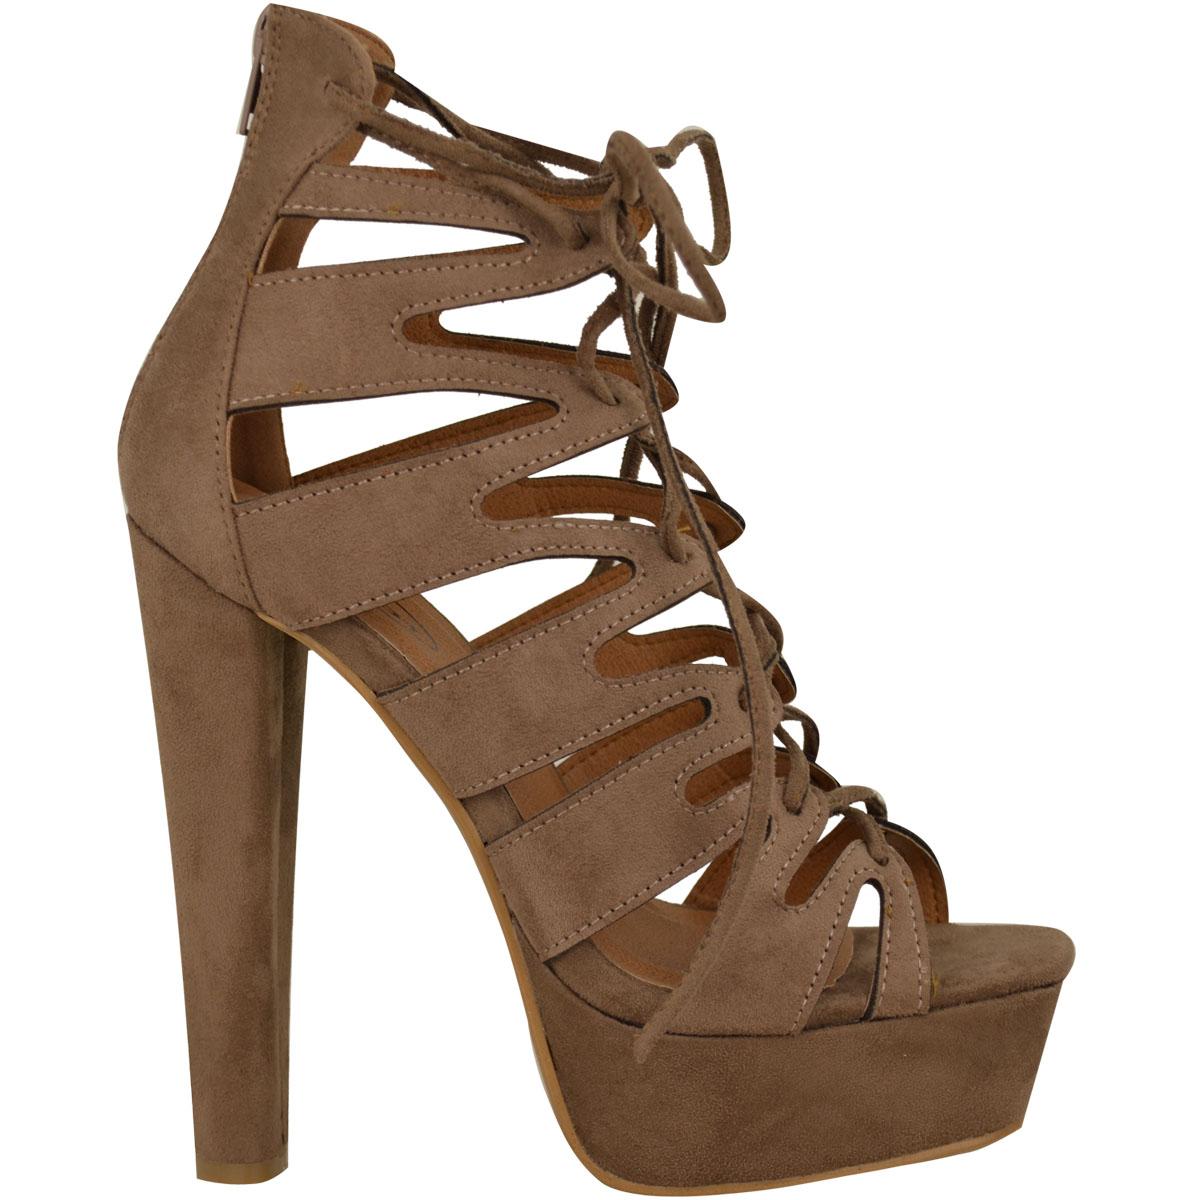 neue damen high heel plattform gladiator sandalen schn ren. Black Bedroom Furniture Sets. Home Design Ideas